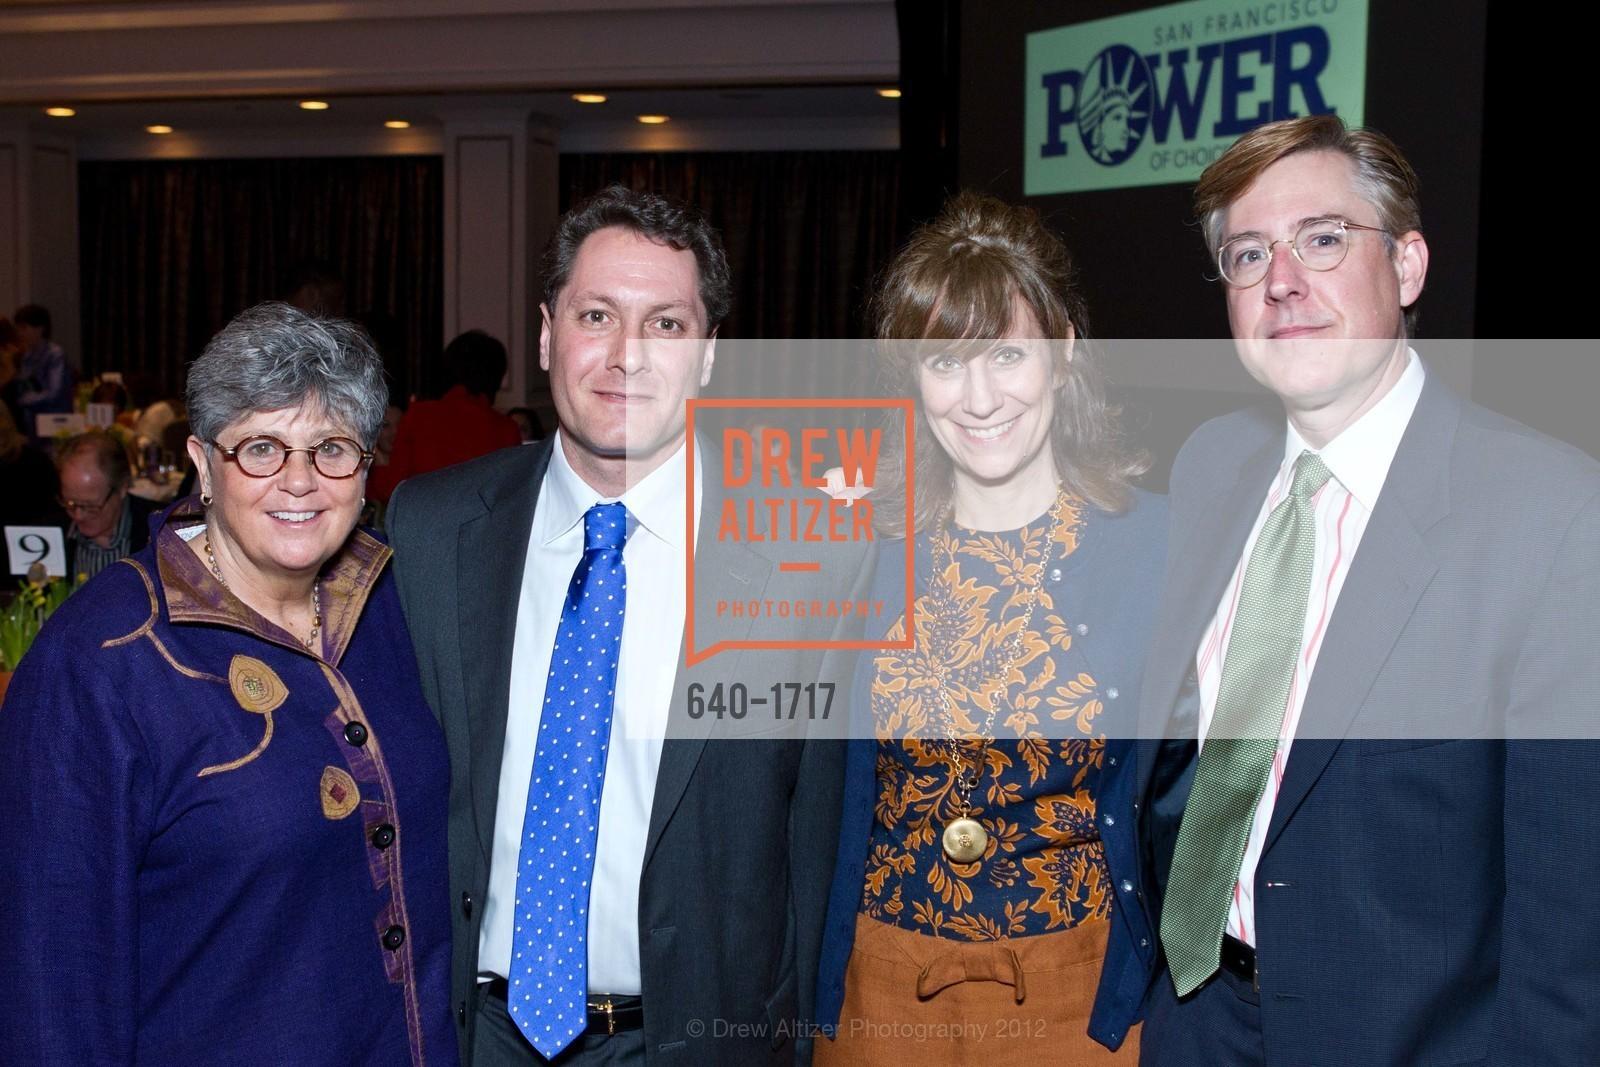 Nancy Keenan, Todd Stave, Lizz Winstead, Thomas Frank, Photo #640-1717